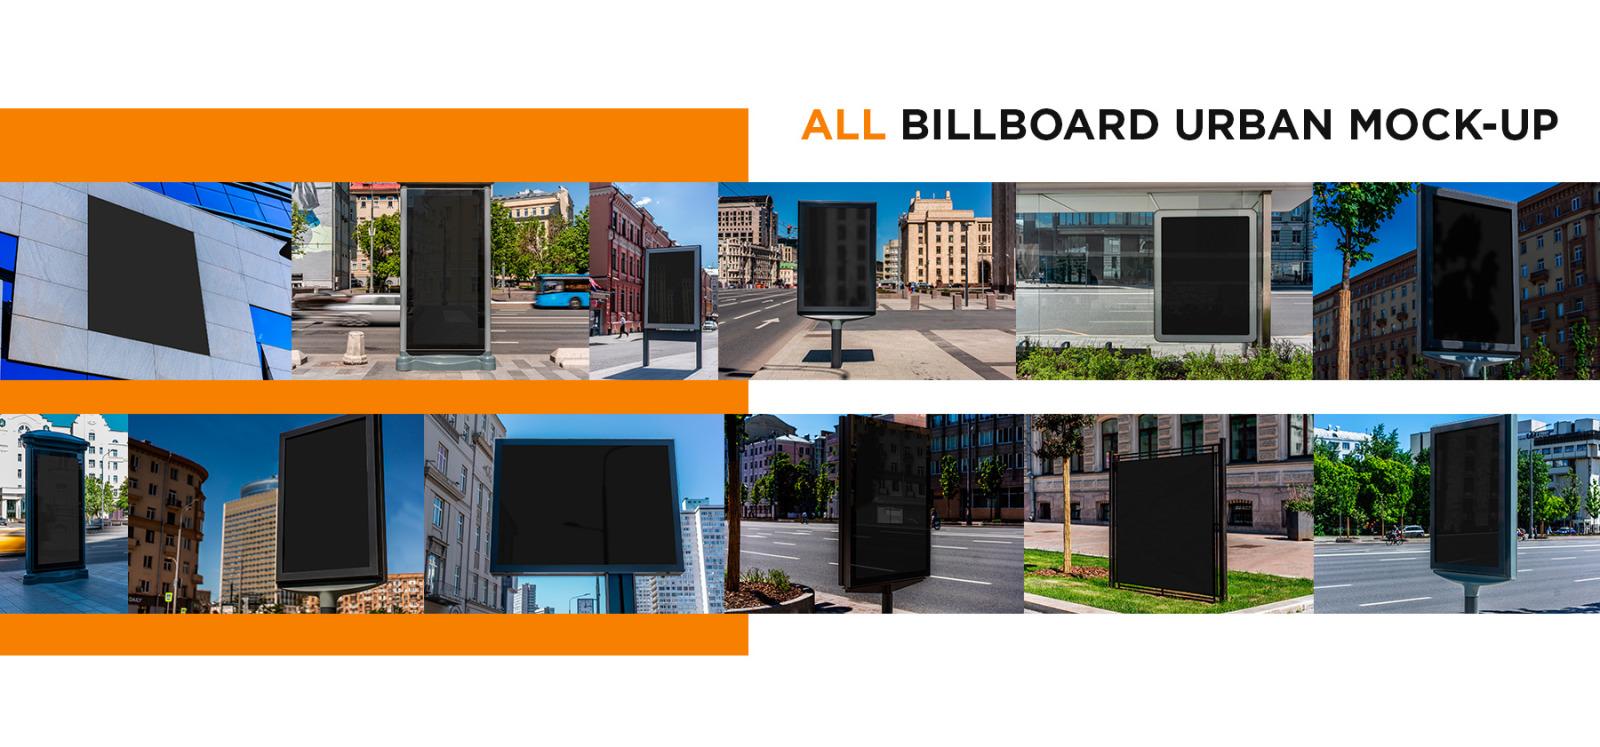 Billboards Urban Mock-Up